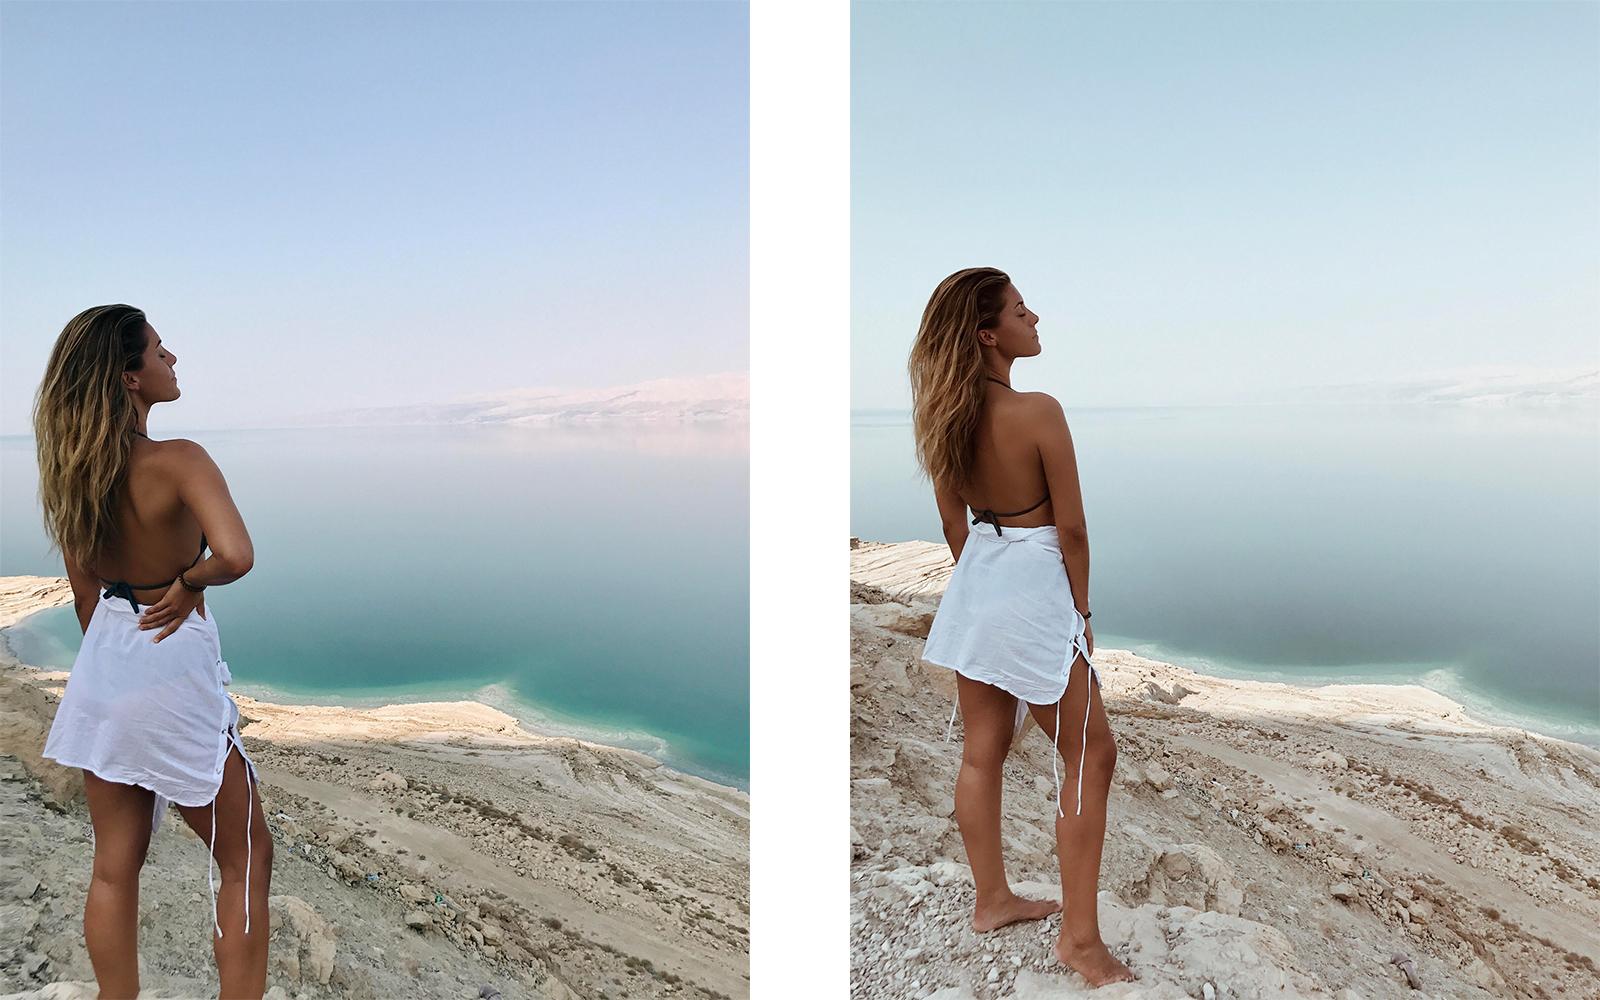 bianca blogg israel